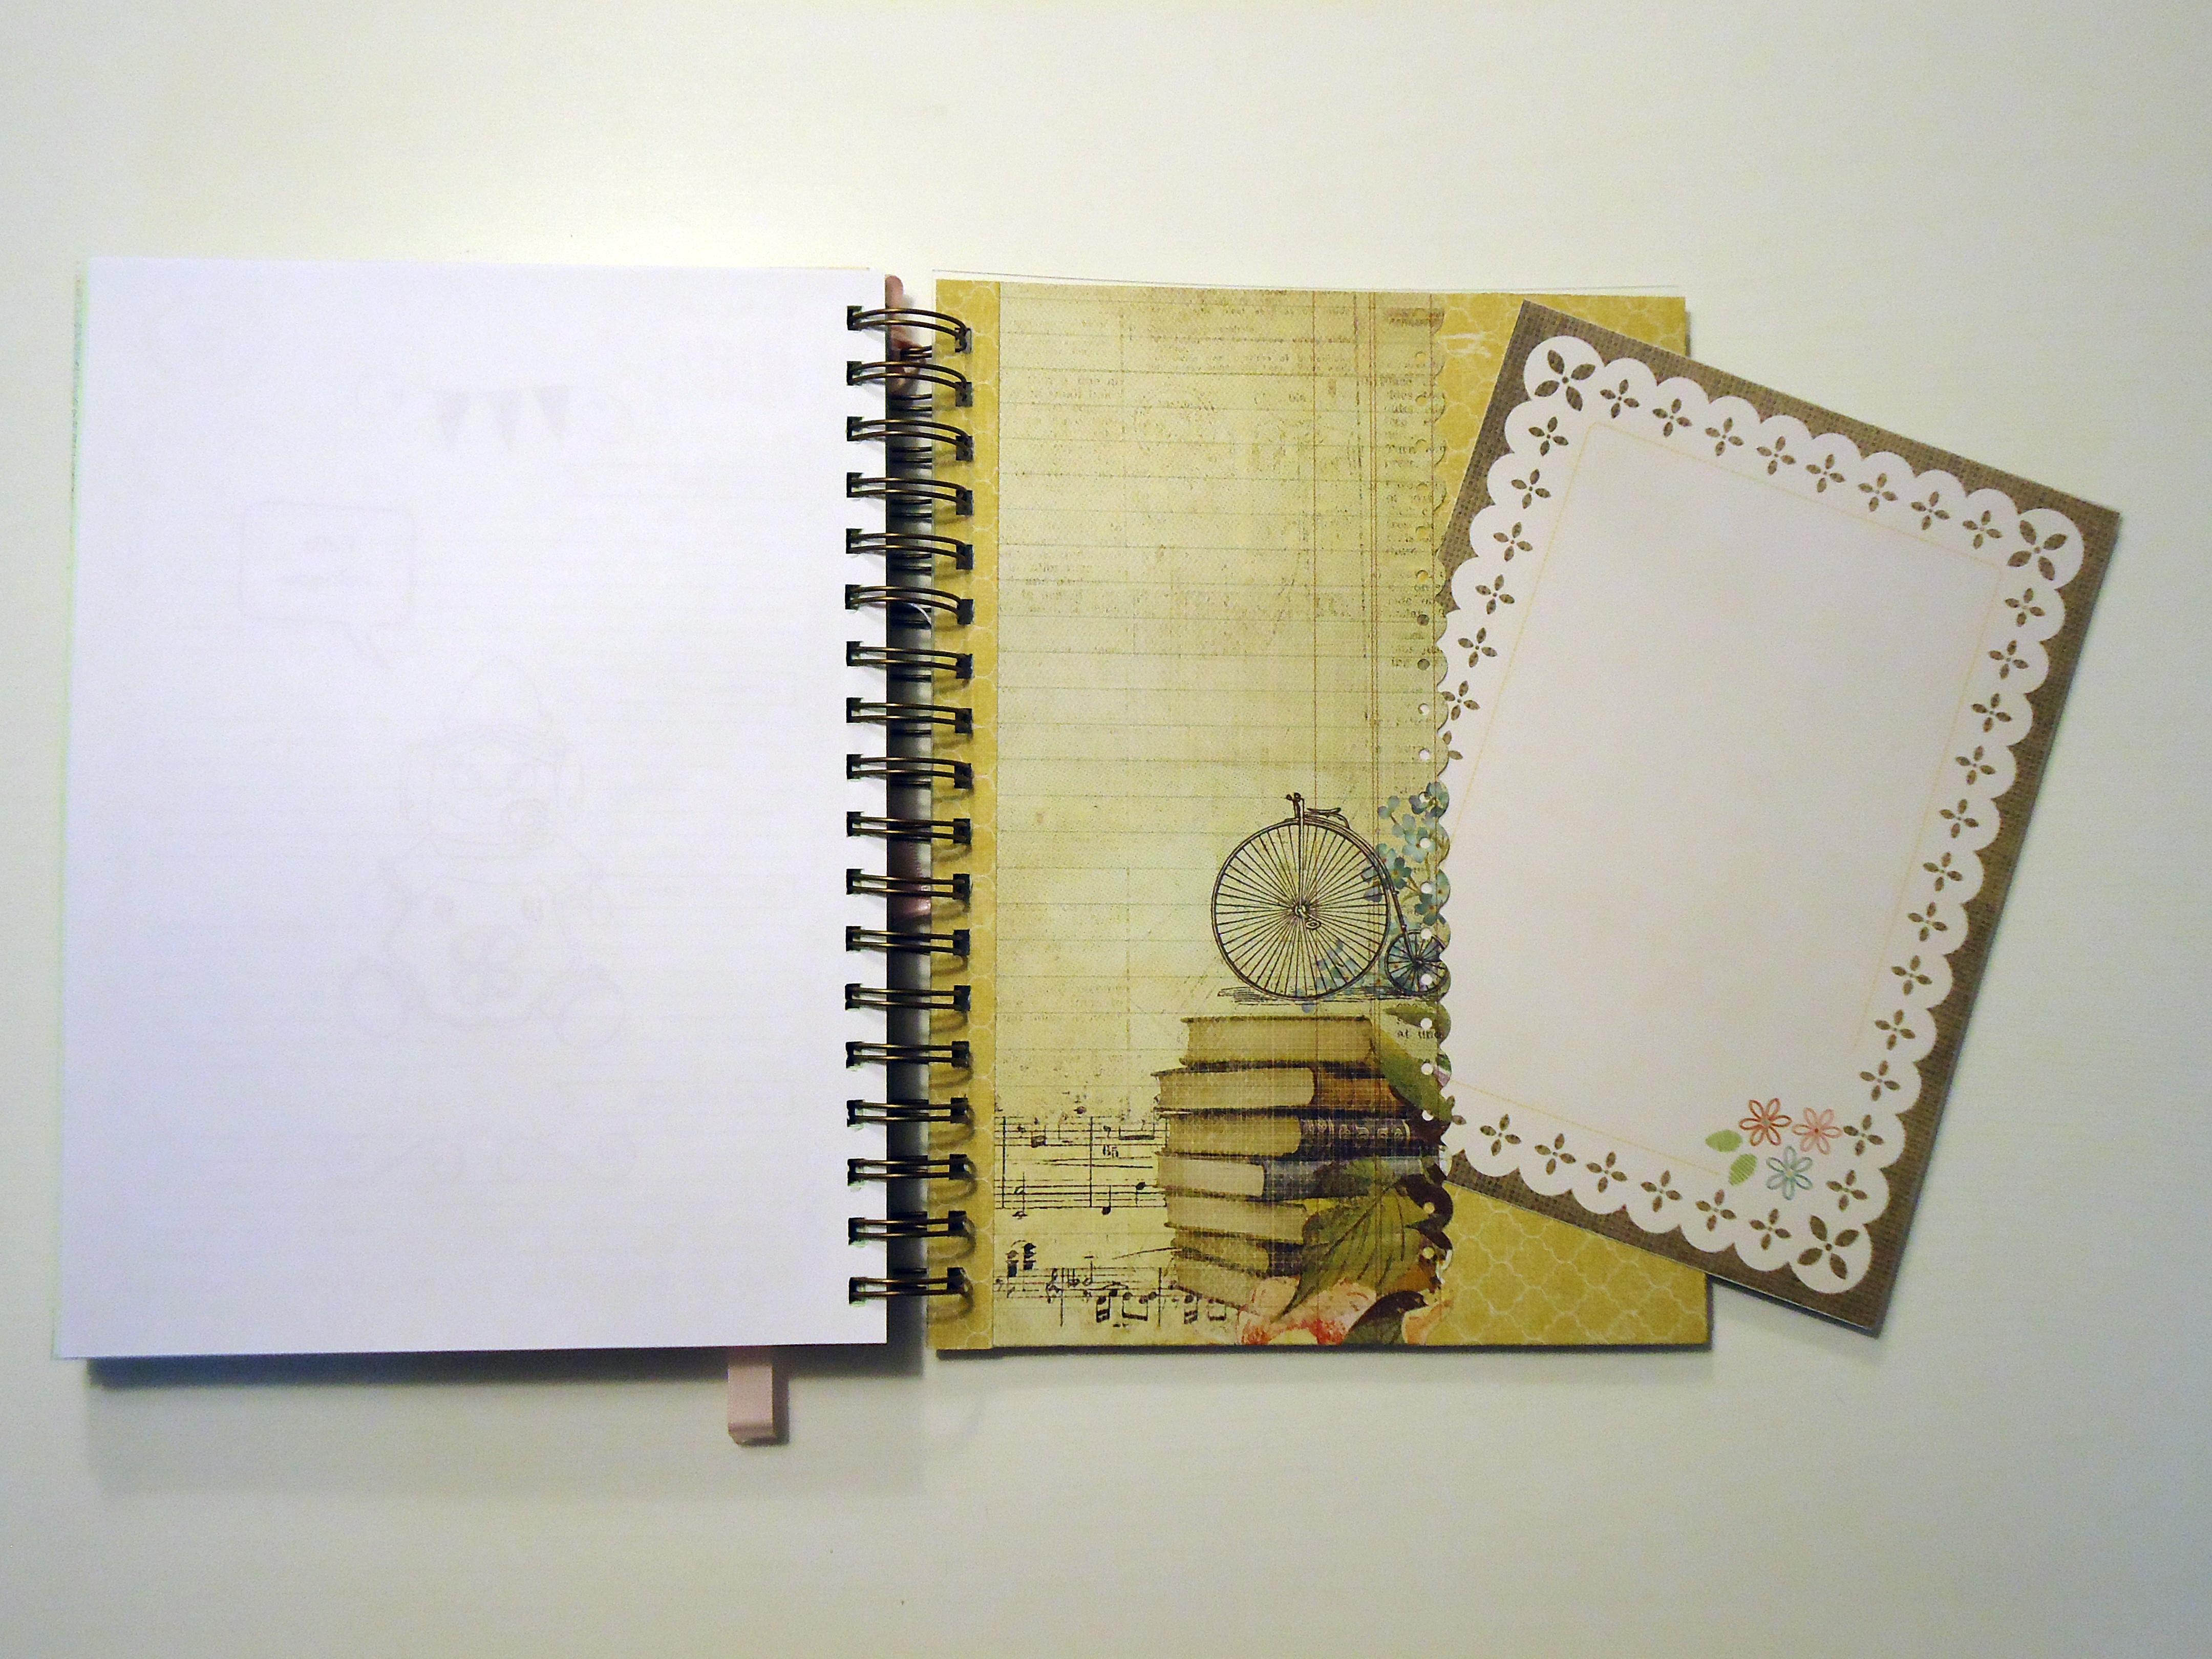 14-agenda-fallera-scpabook